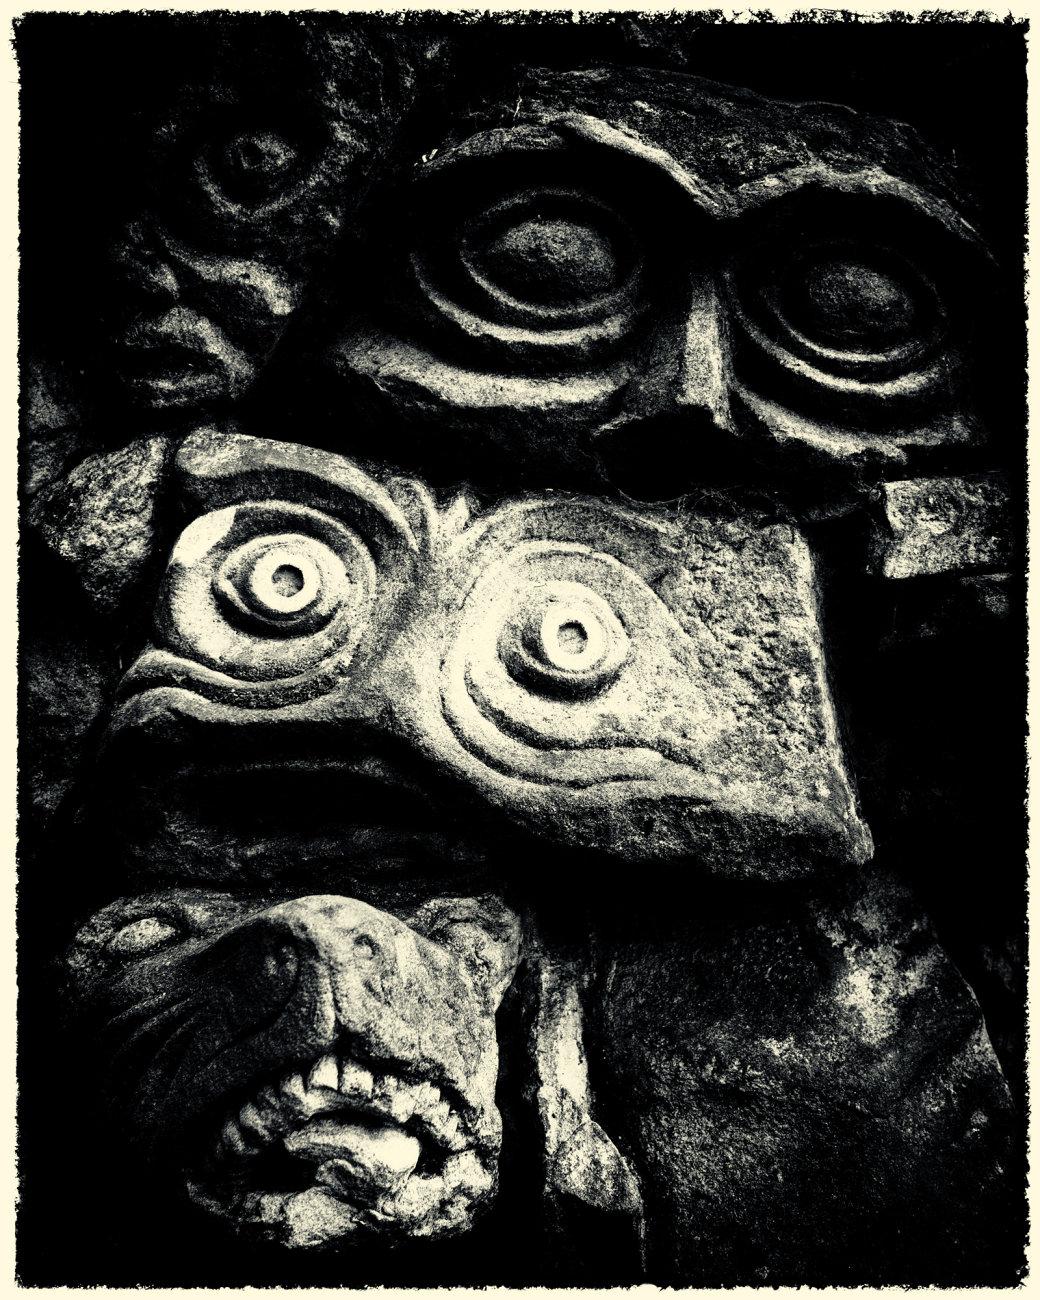 Seven Eyes in Purgatory